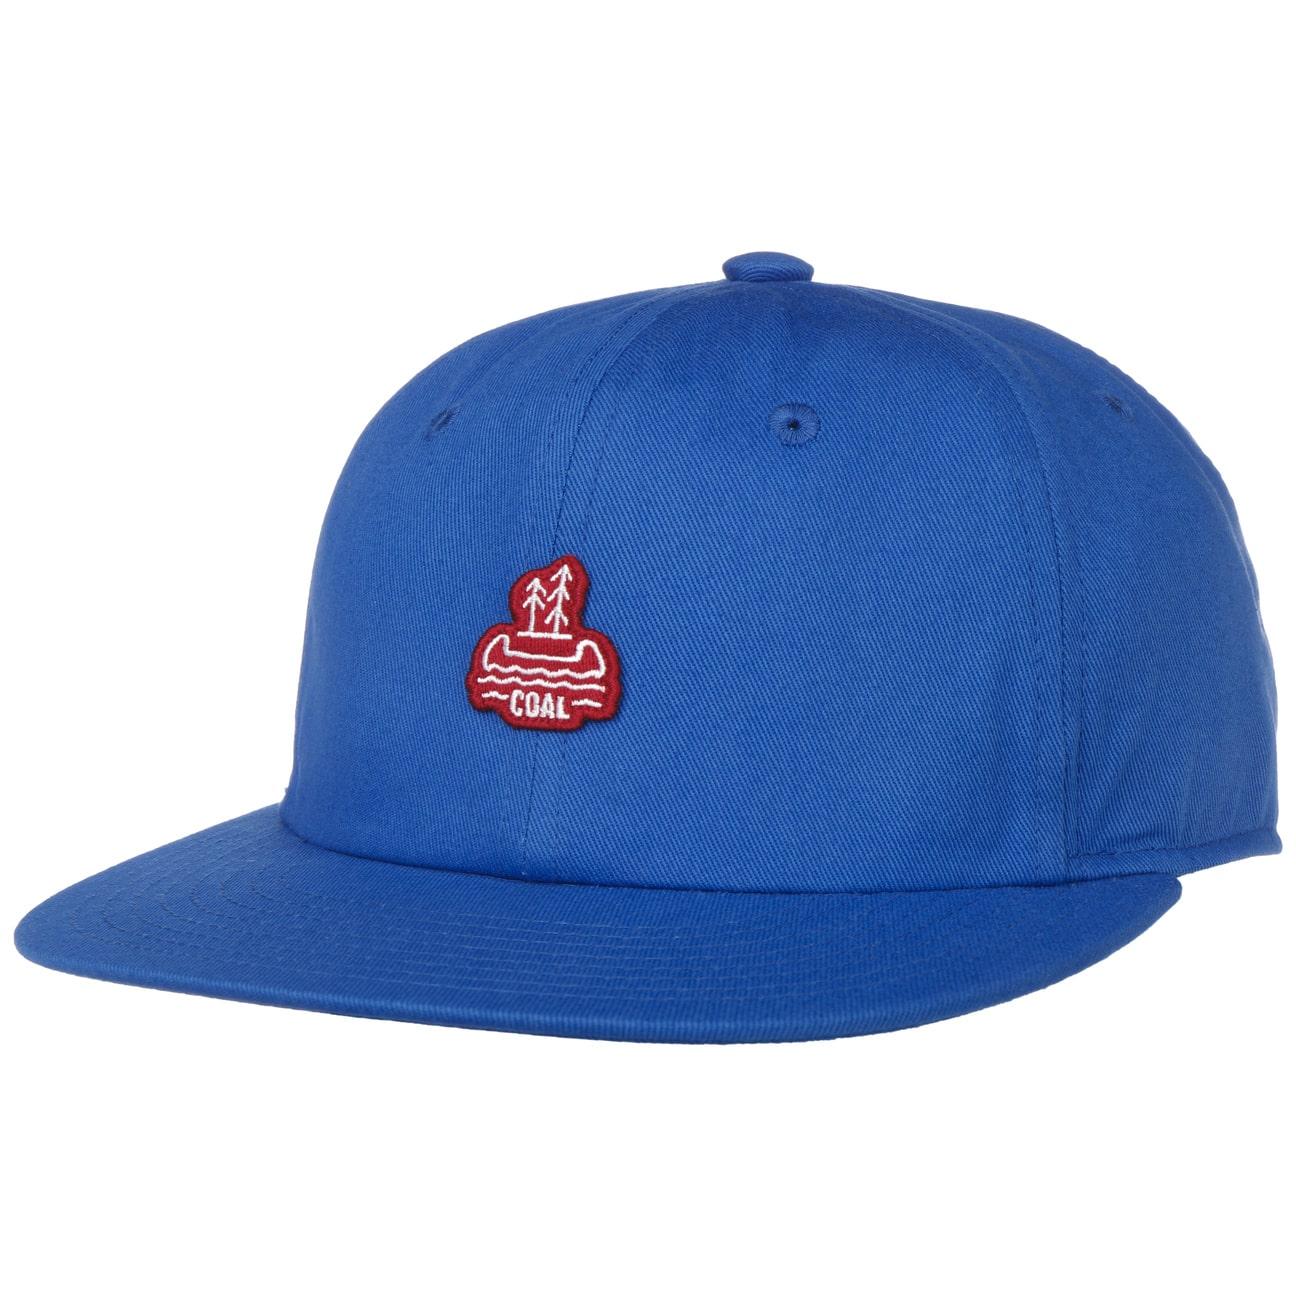 Gorra The Junior Snapback Cap by Coal  gorra de algod?n